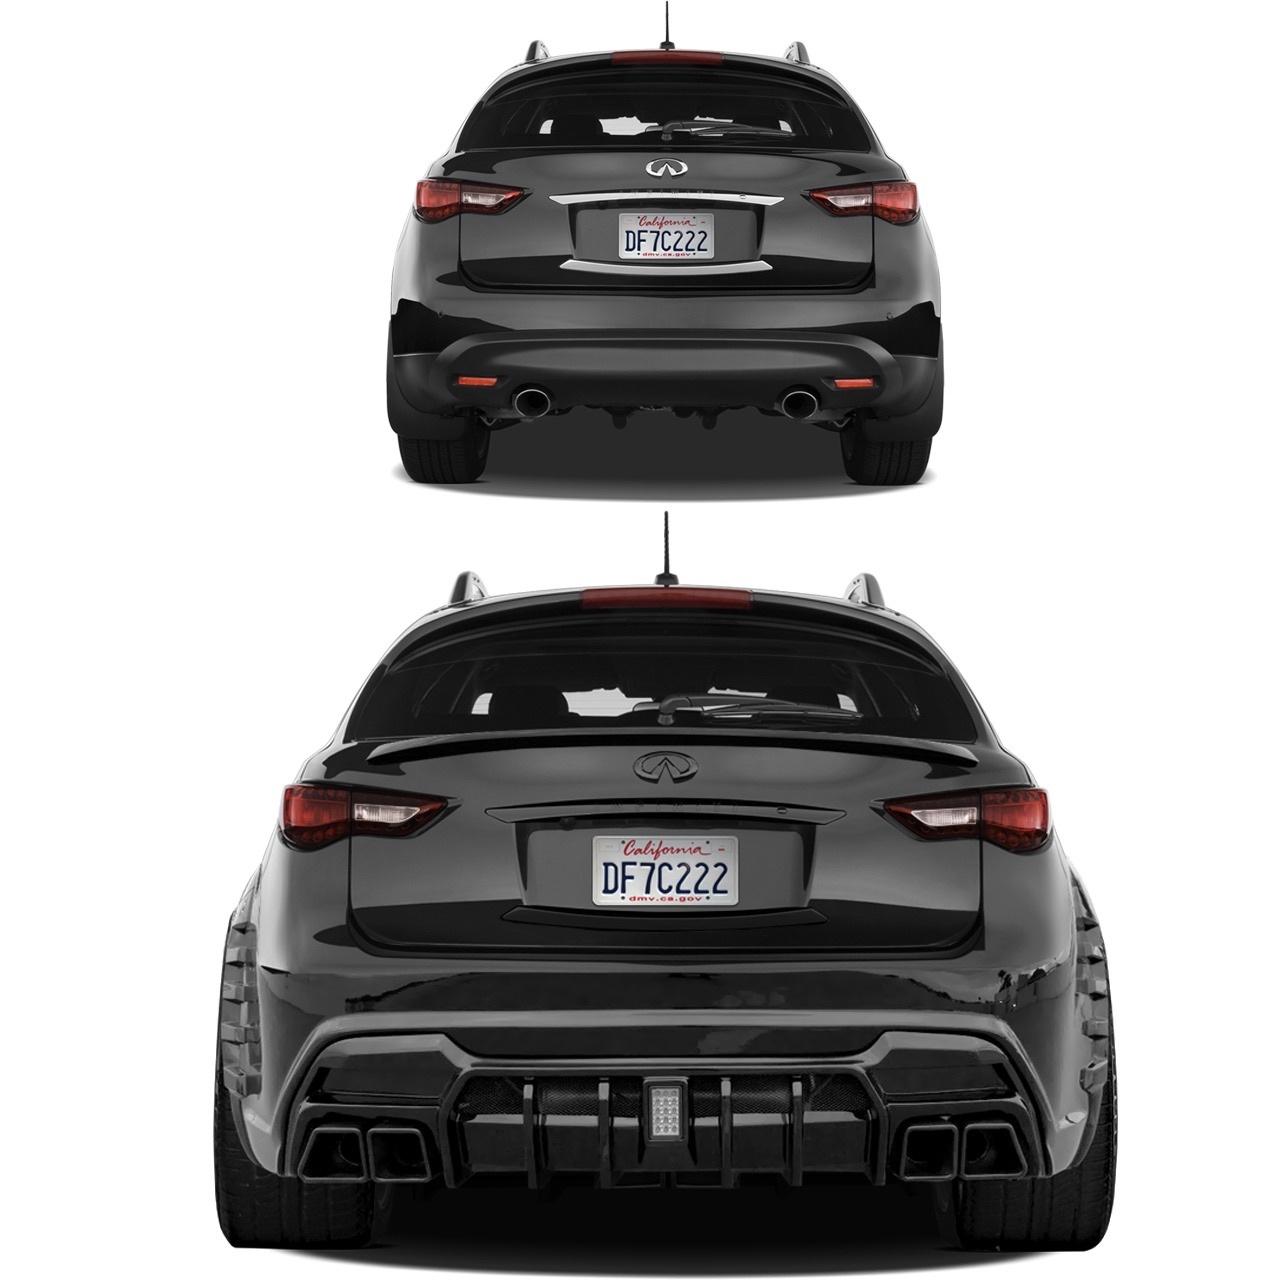 Renegade body kit for Infiniti QX70 (FX S51) carbon